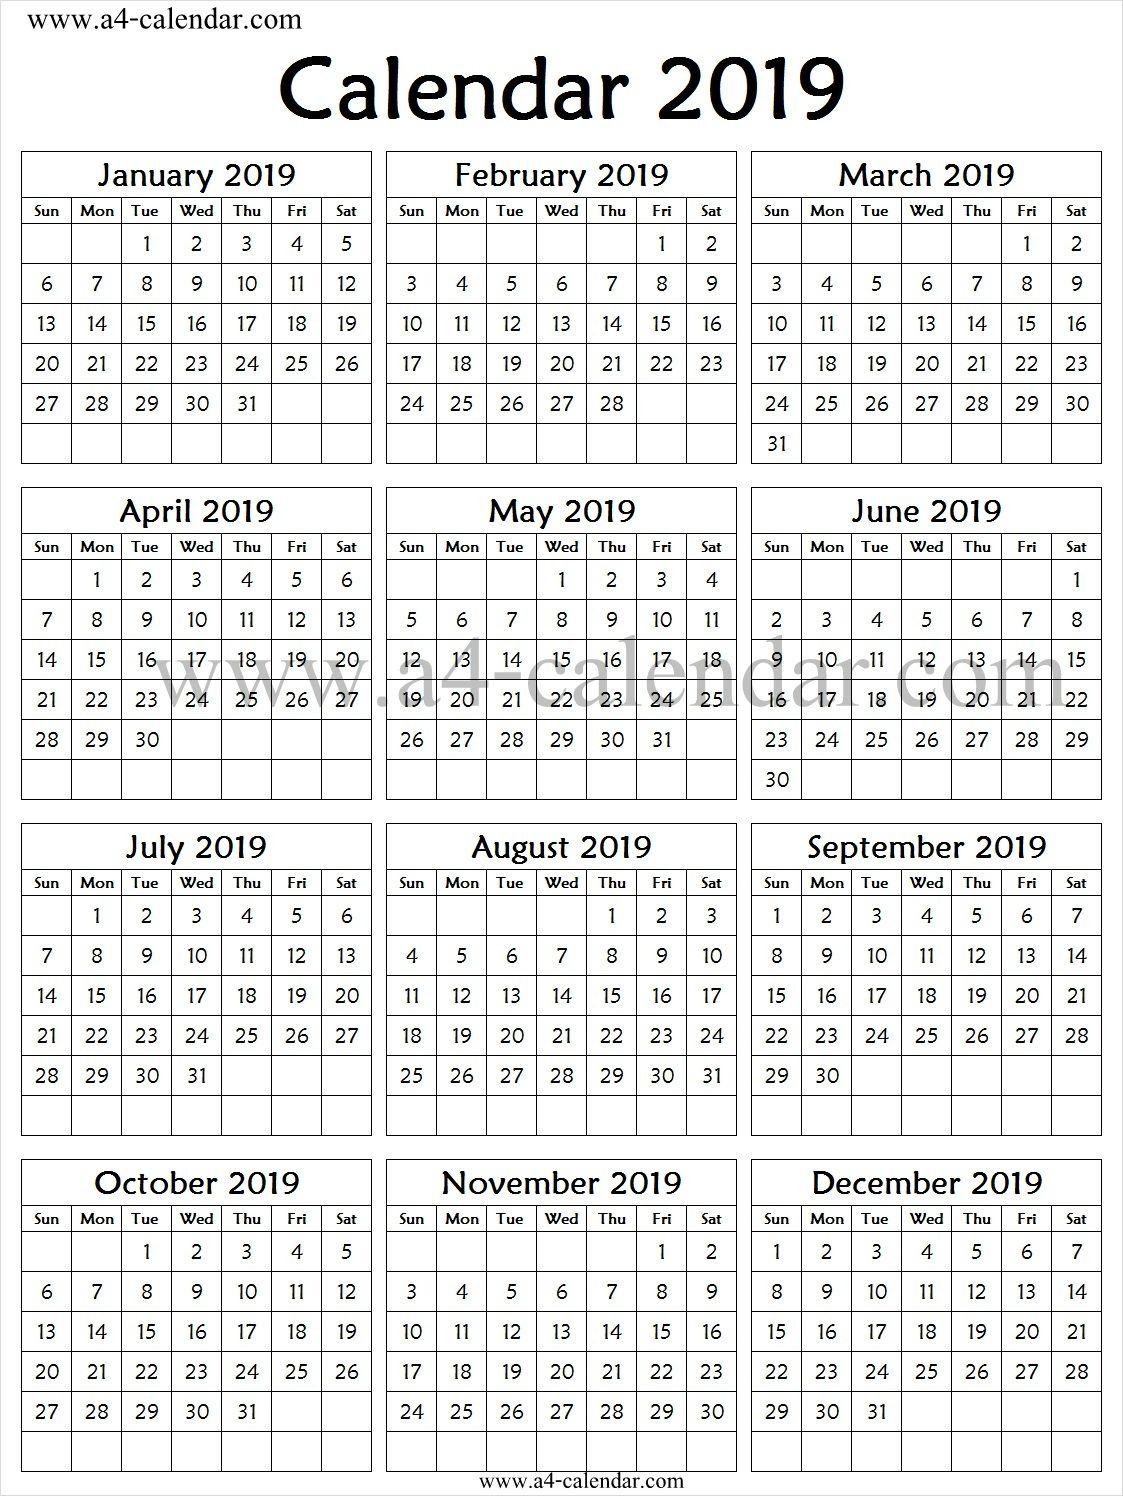 2019 Calendar One Page Vertical | 2019 Calendar Template